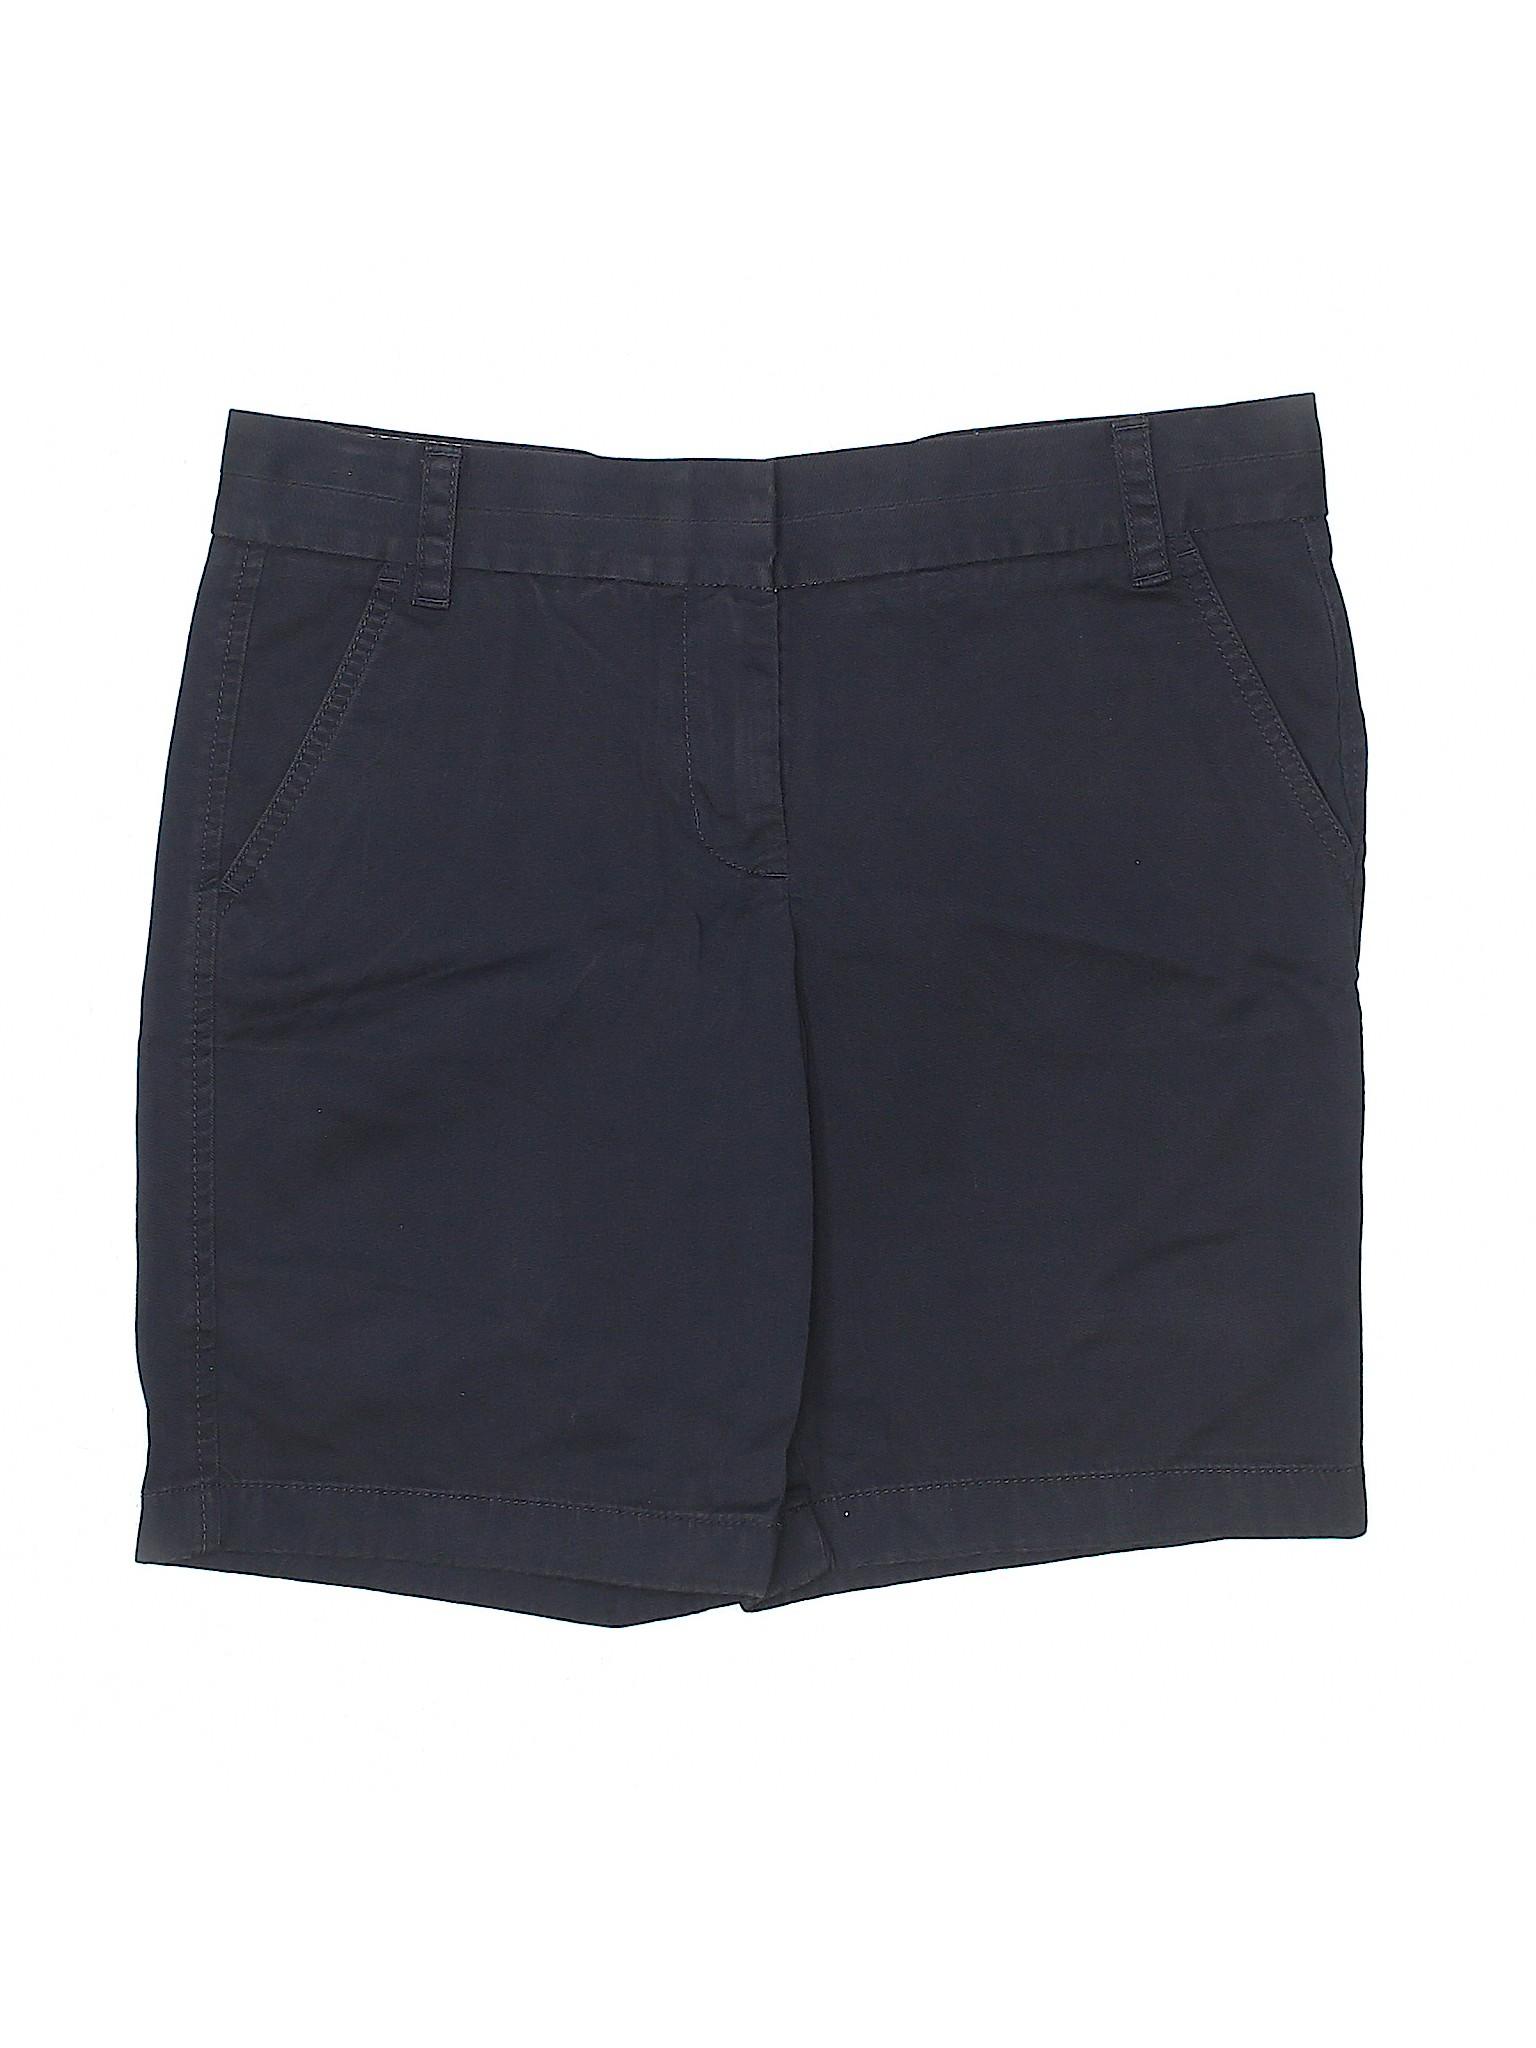 J Khaki Shorts Khaki Khaki Crew Boutique Shorts J Boutique J Crew Shorts Crew Boutique rfWfZO7wS